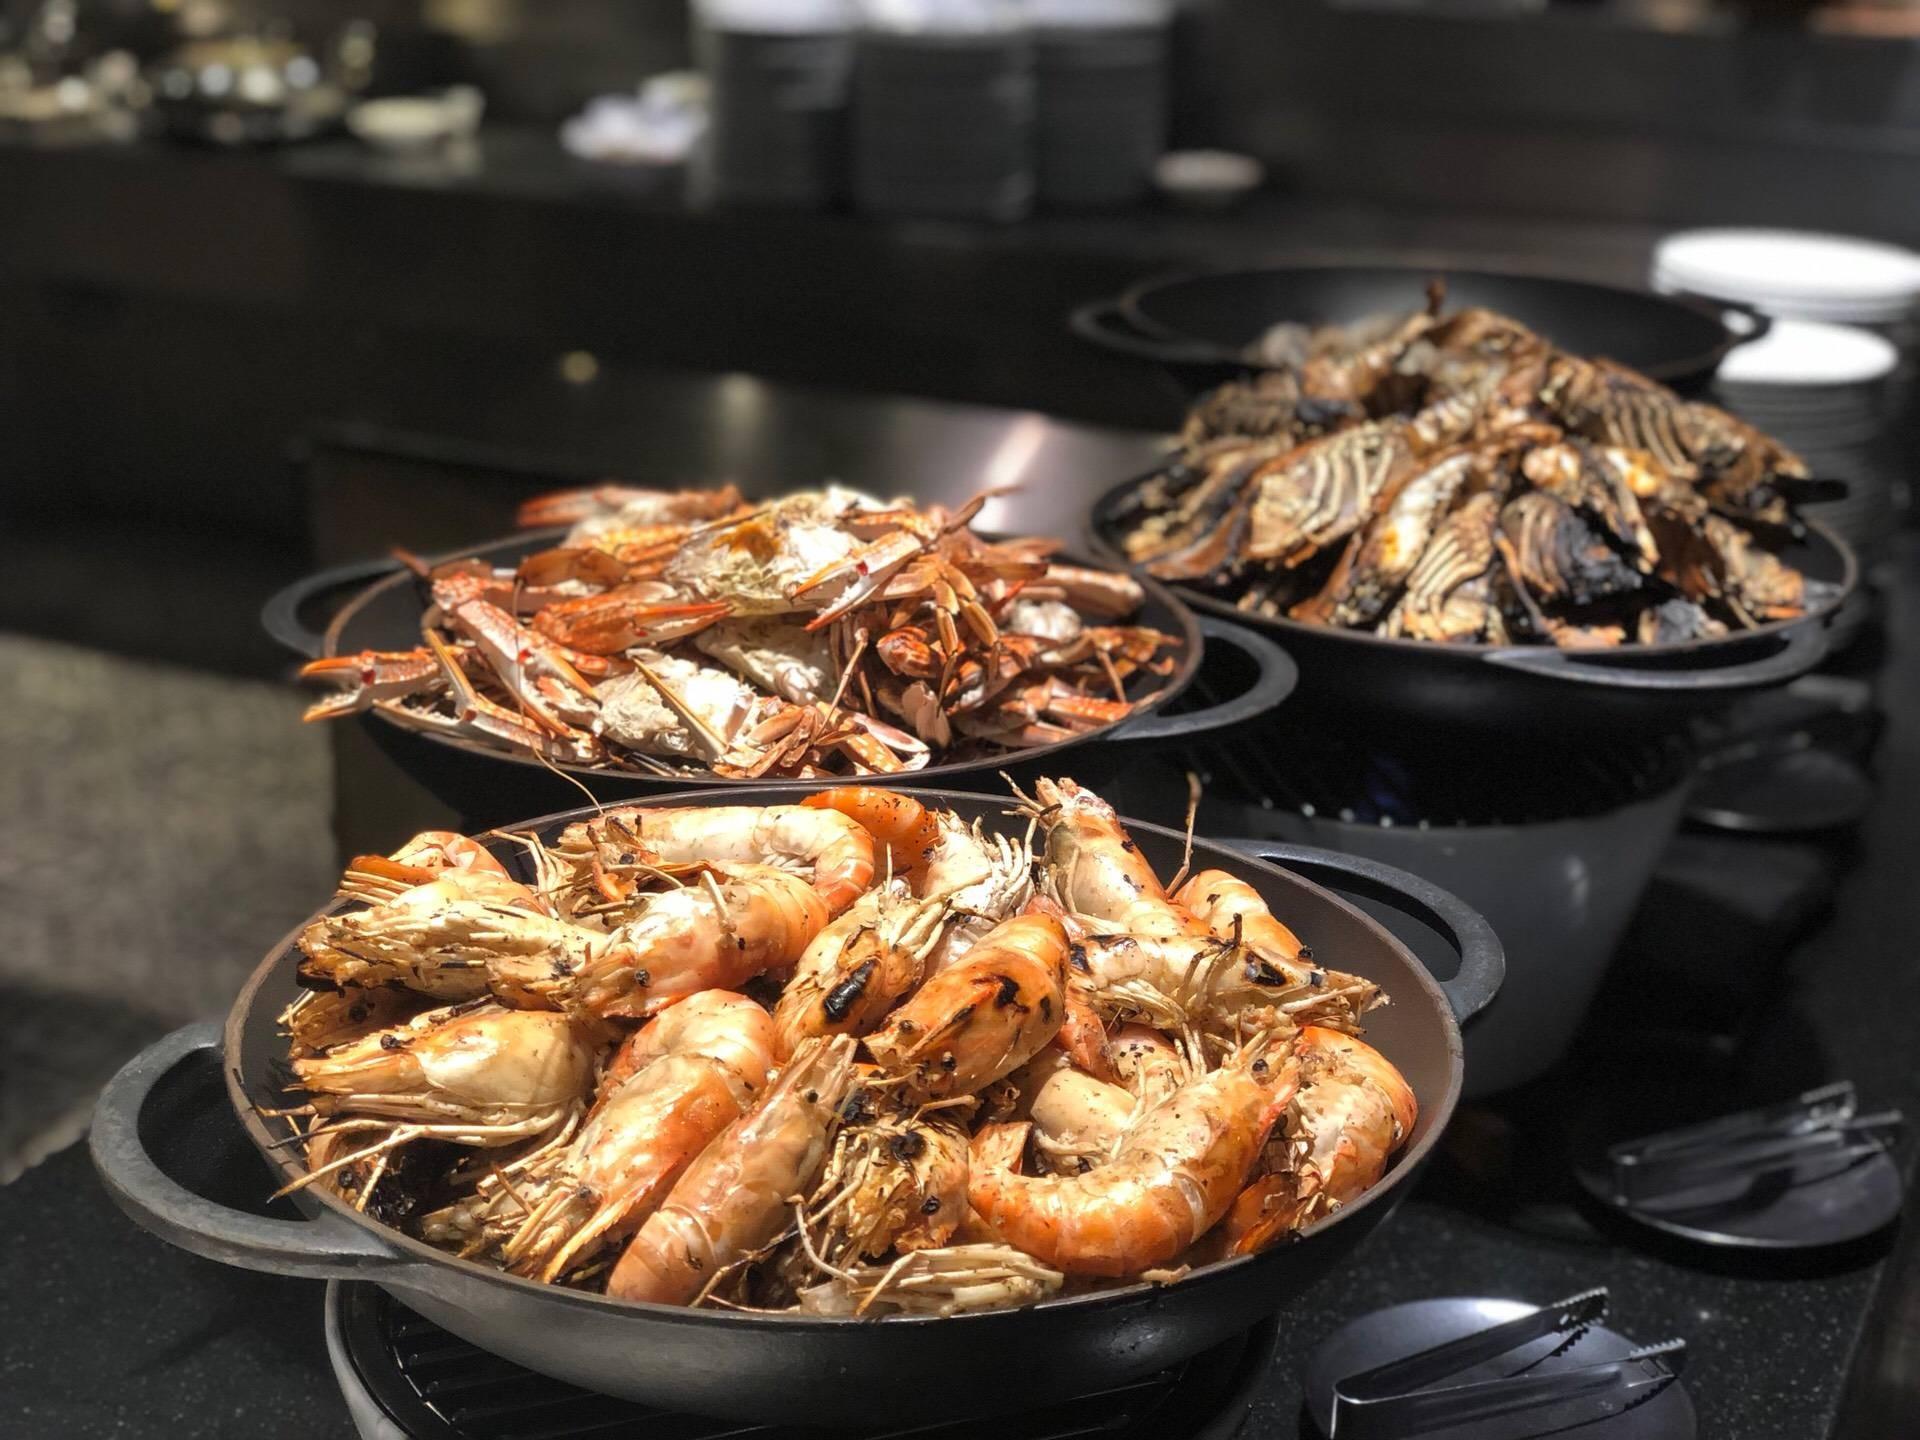 Starz Diner - The Great Charcoal BBQ Buffet. Hard Rock Hotel Pattaya